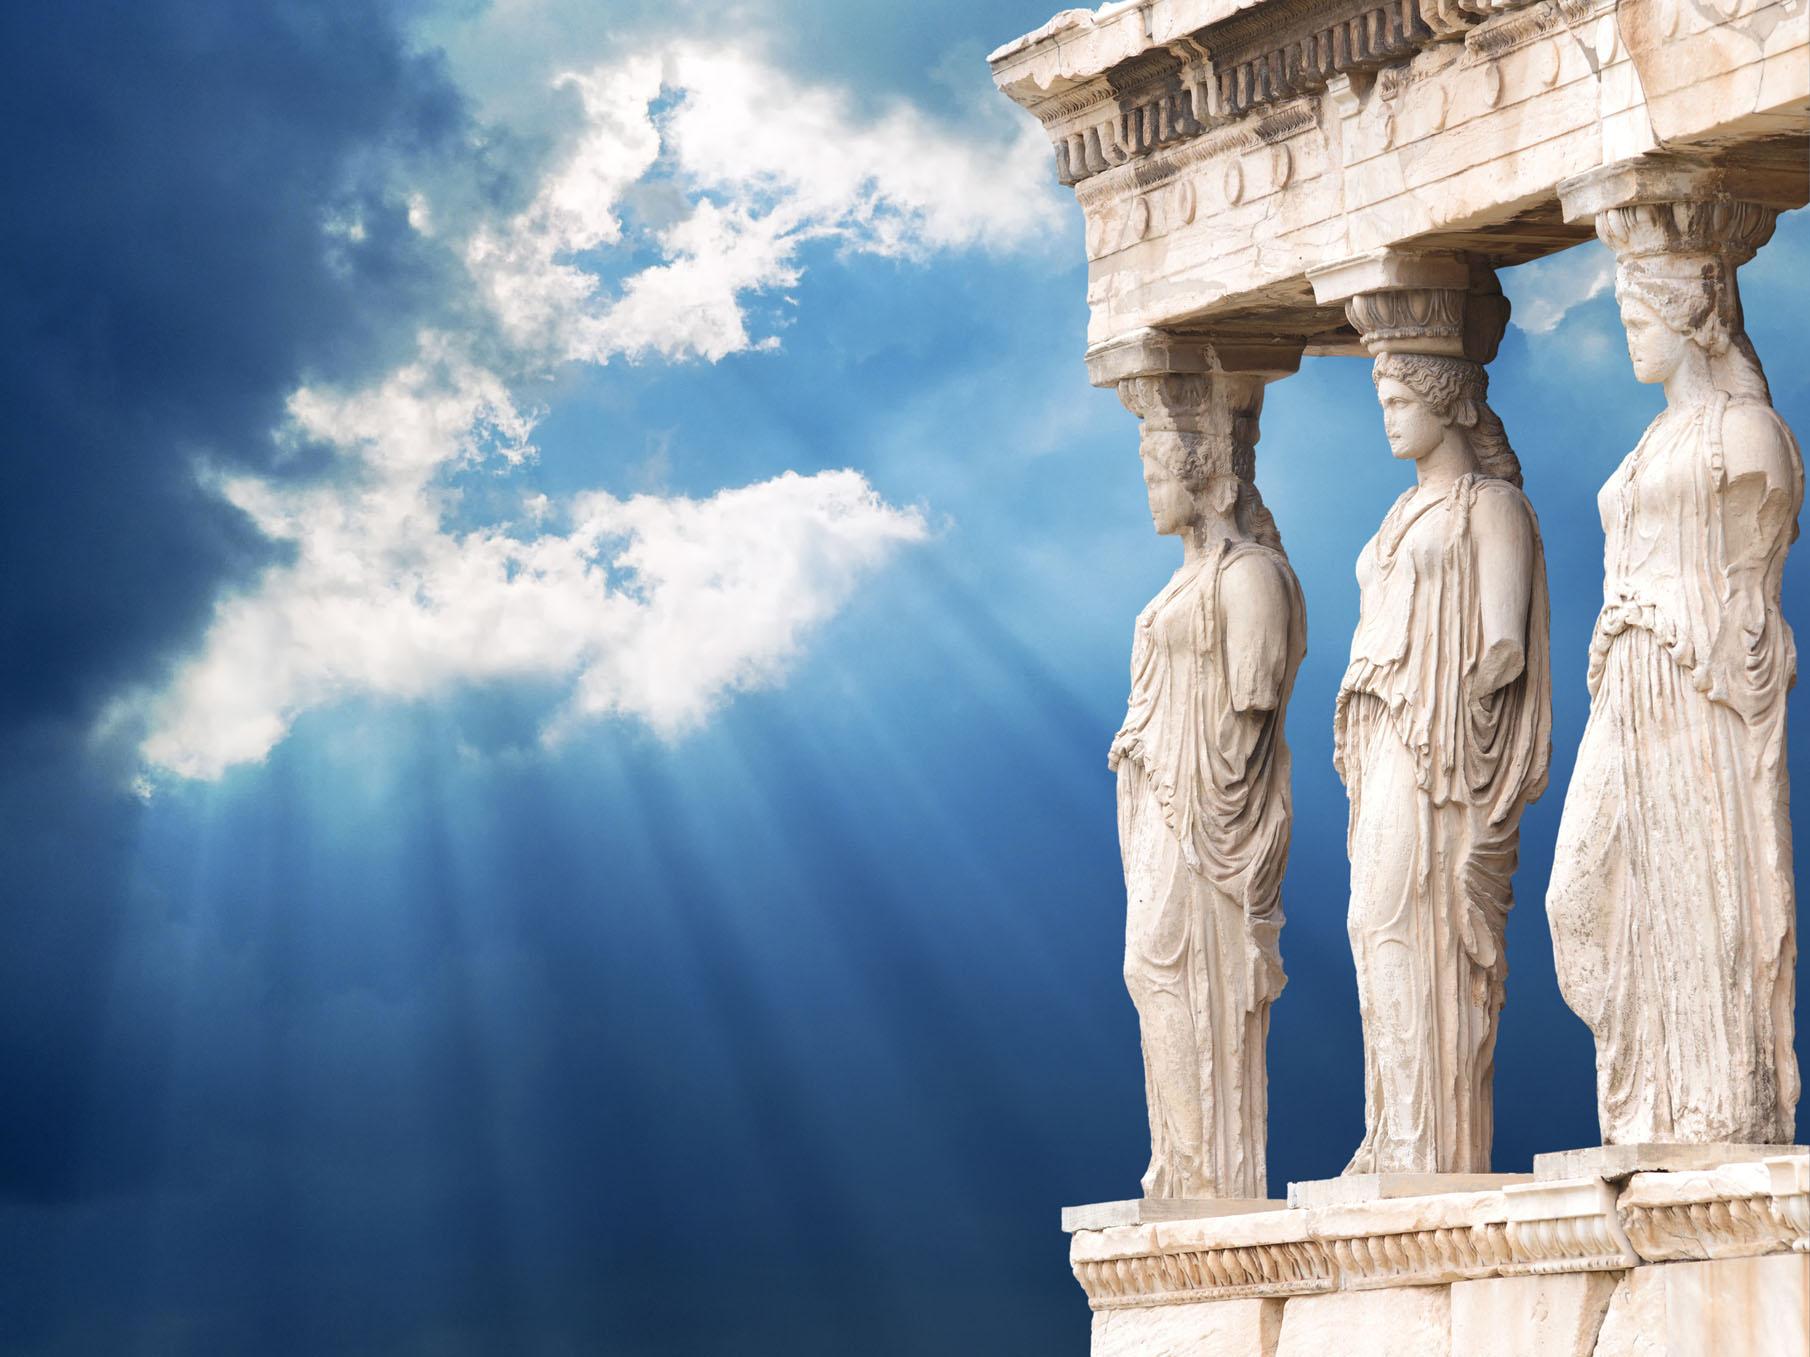 viajes organizados baratos a Grecia